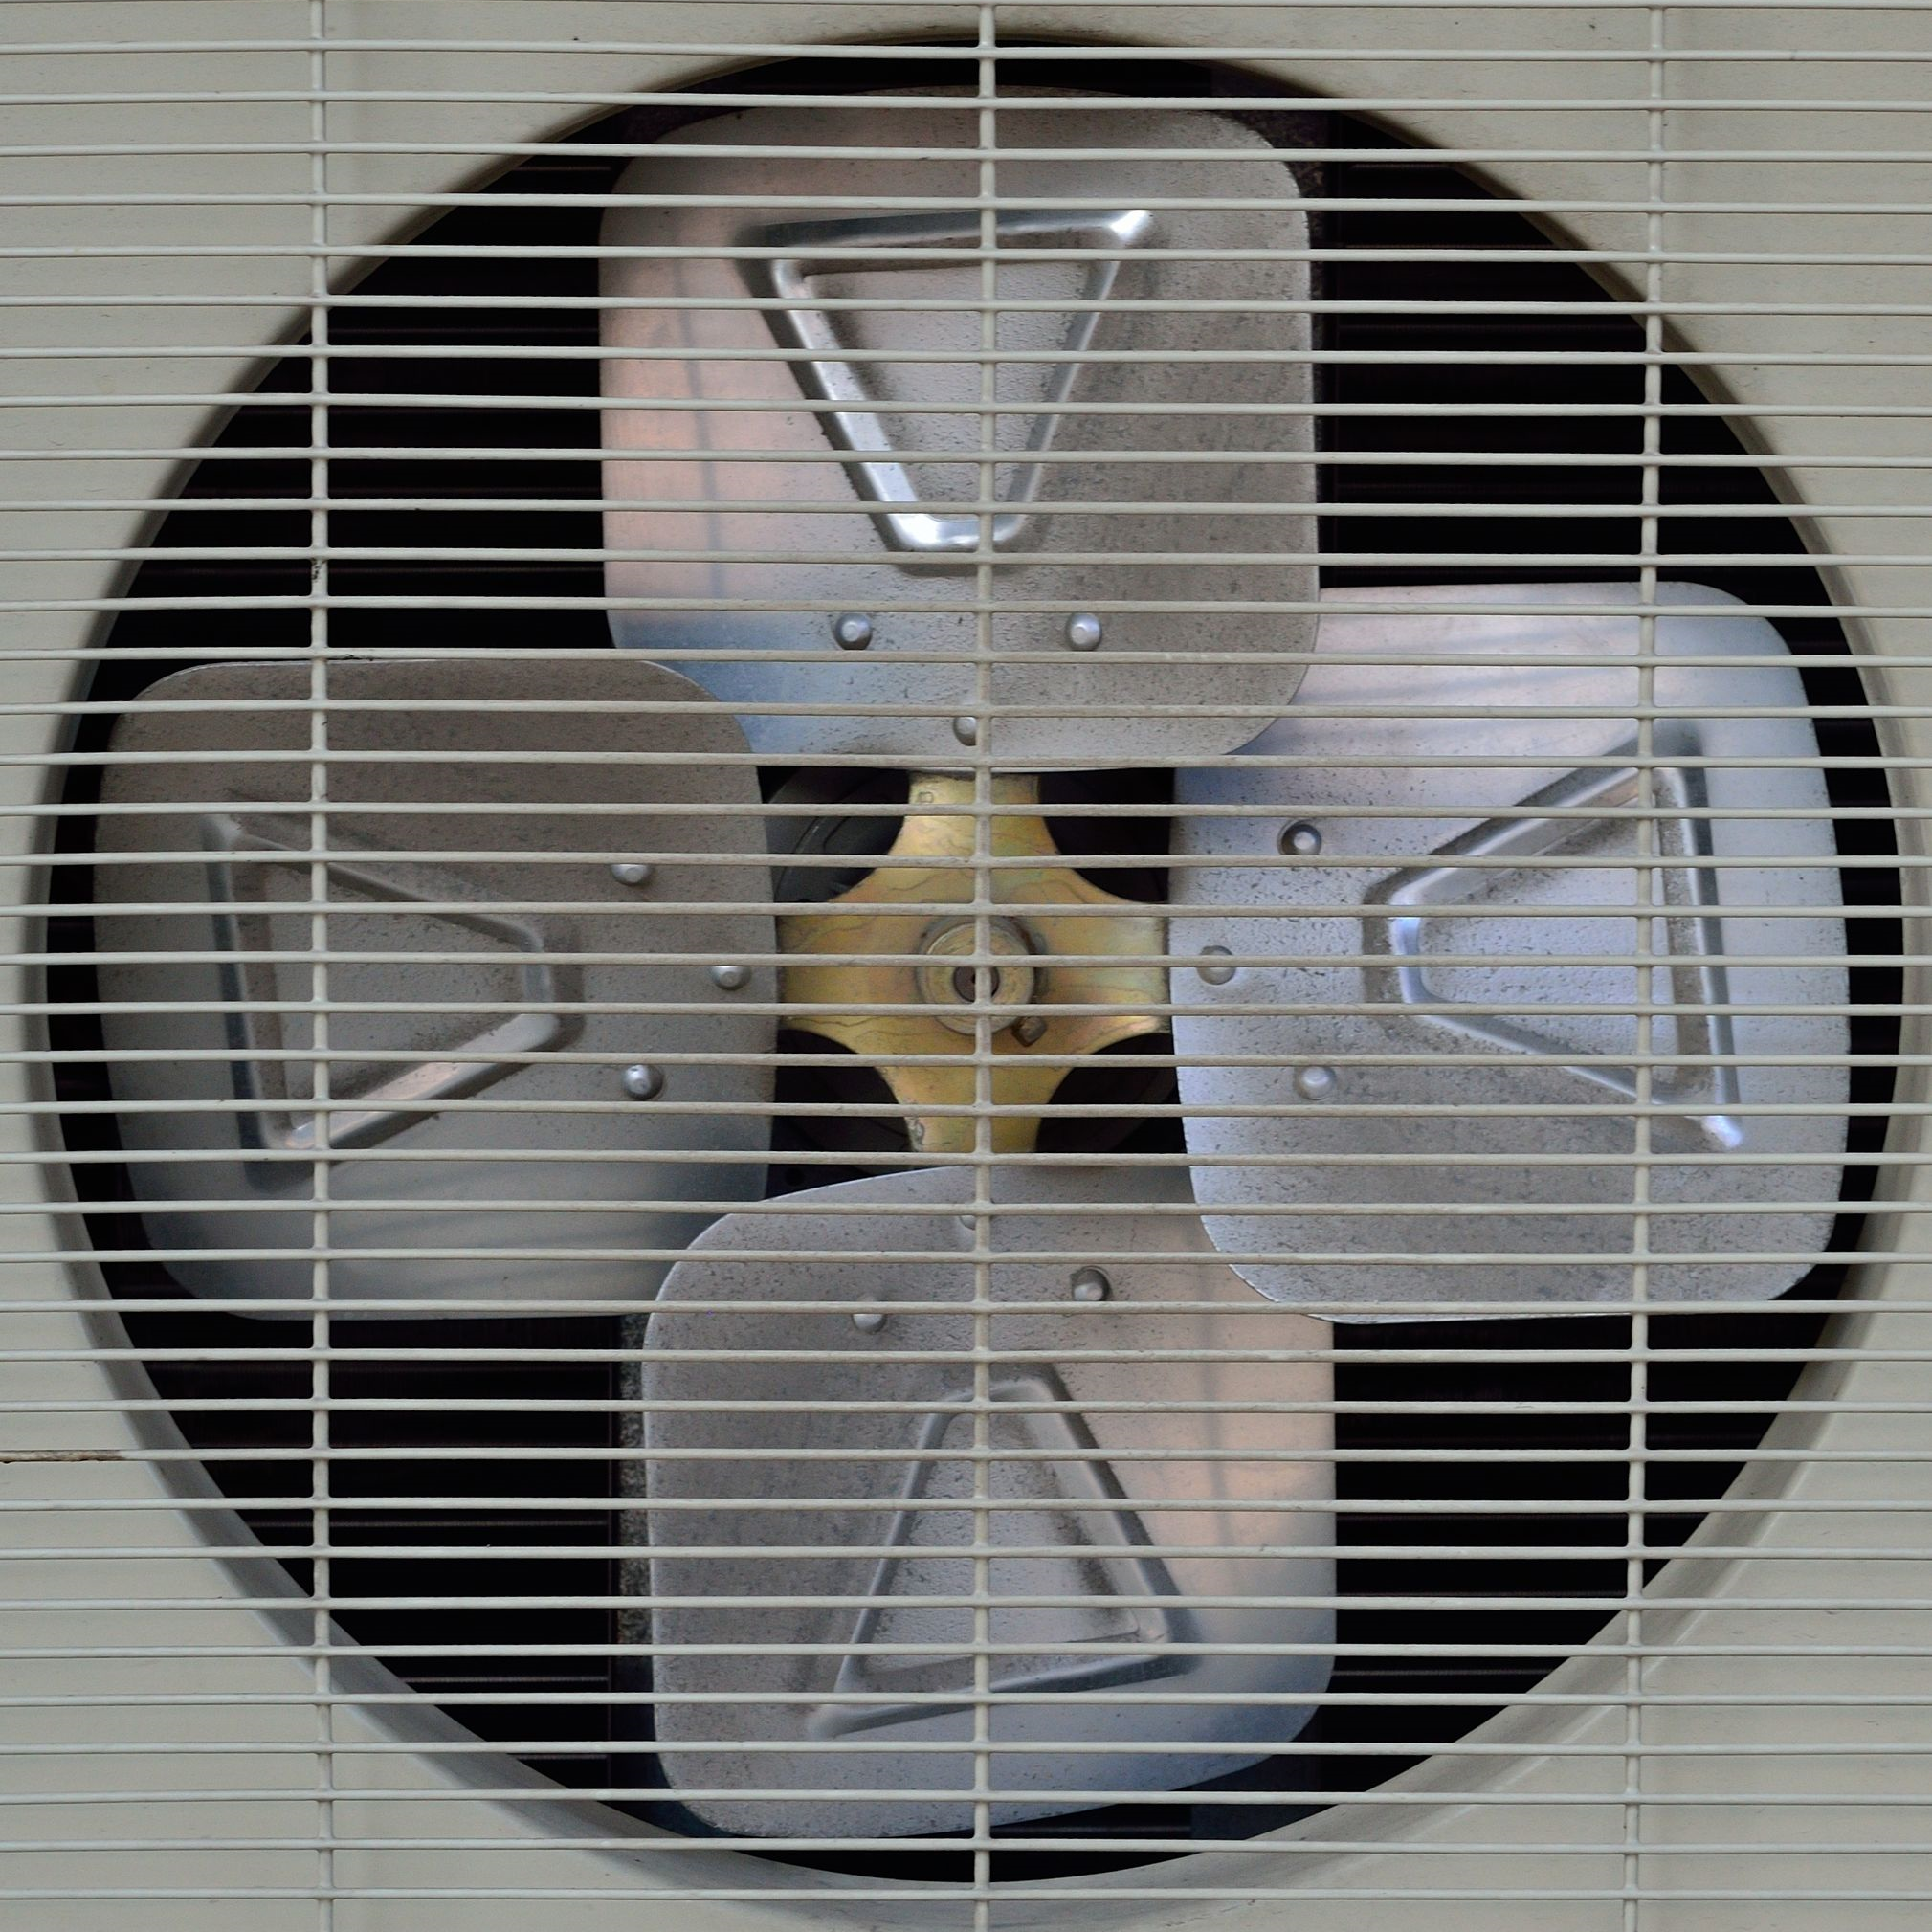 condenser motor up close